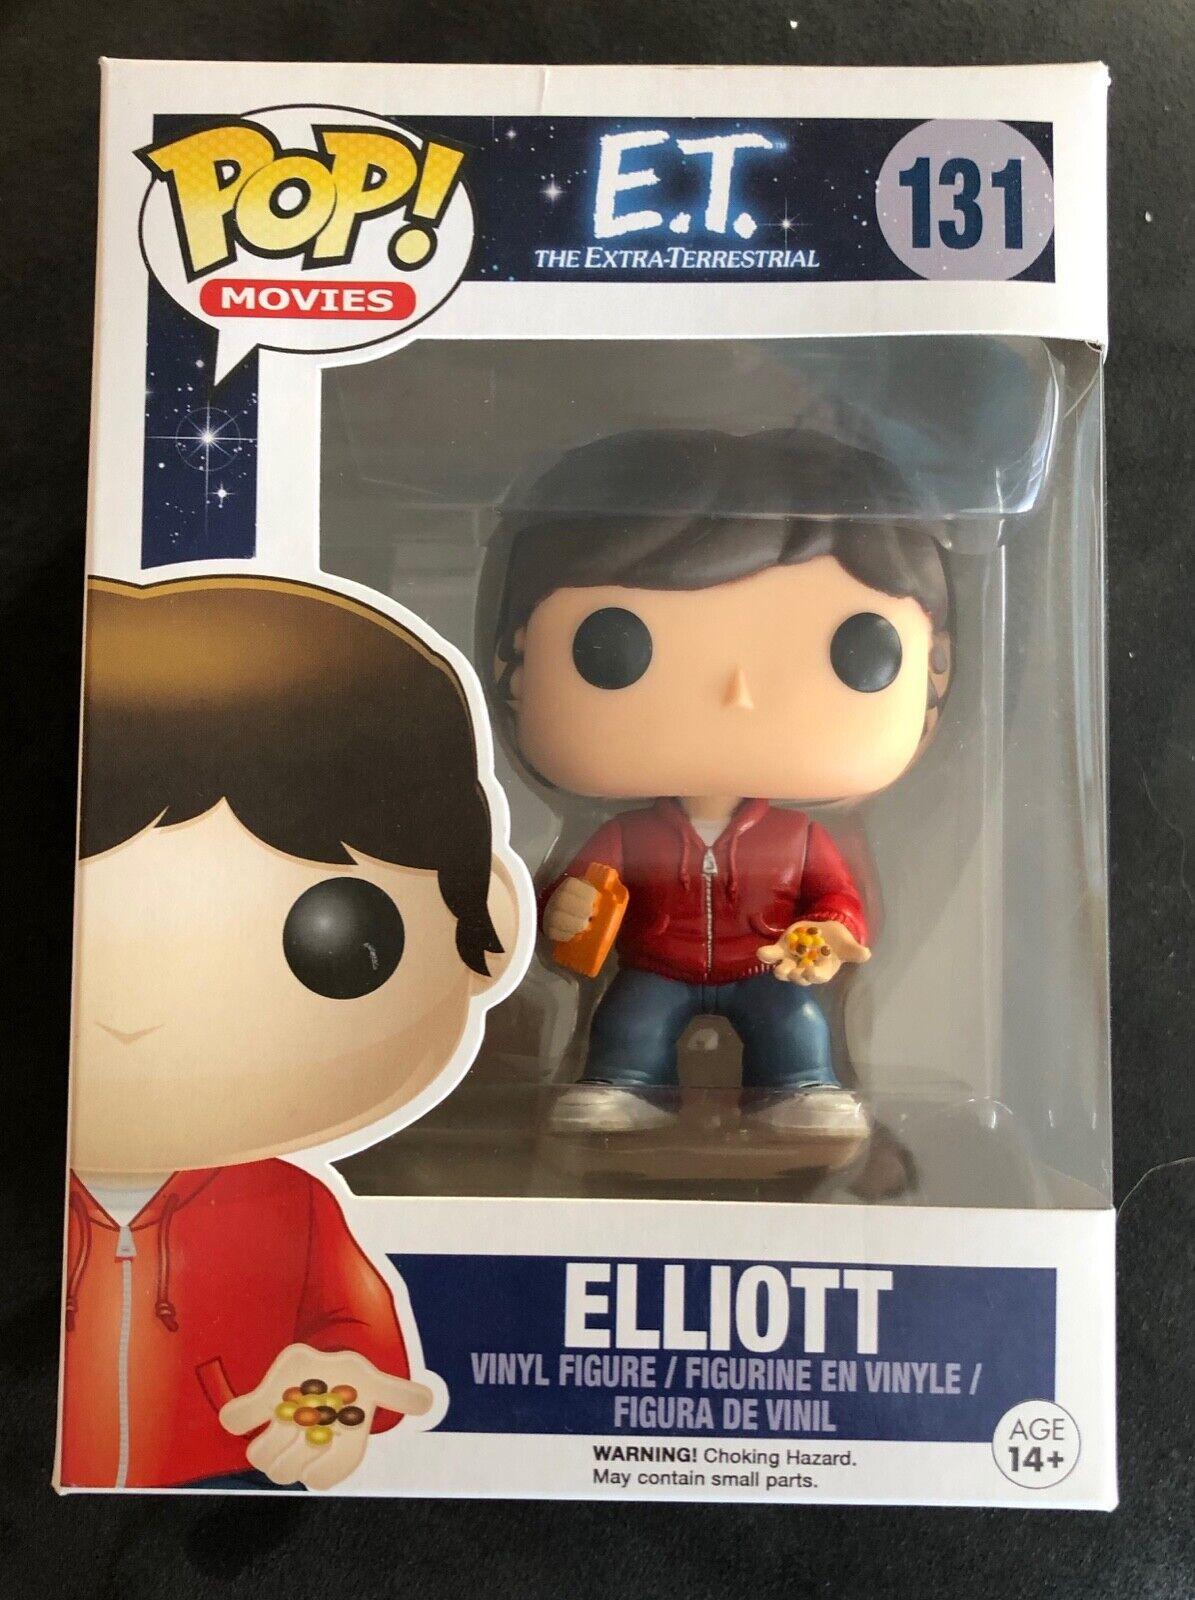 Funko pop E.T. ELLIOTT  - NEW, SEALED -